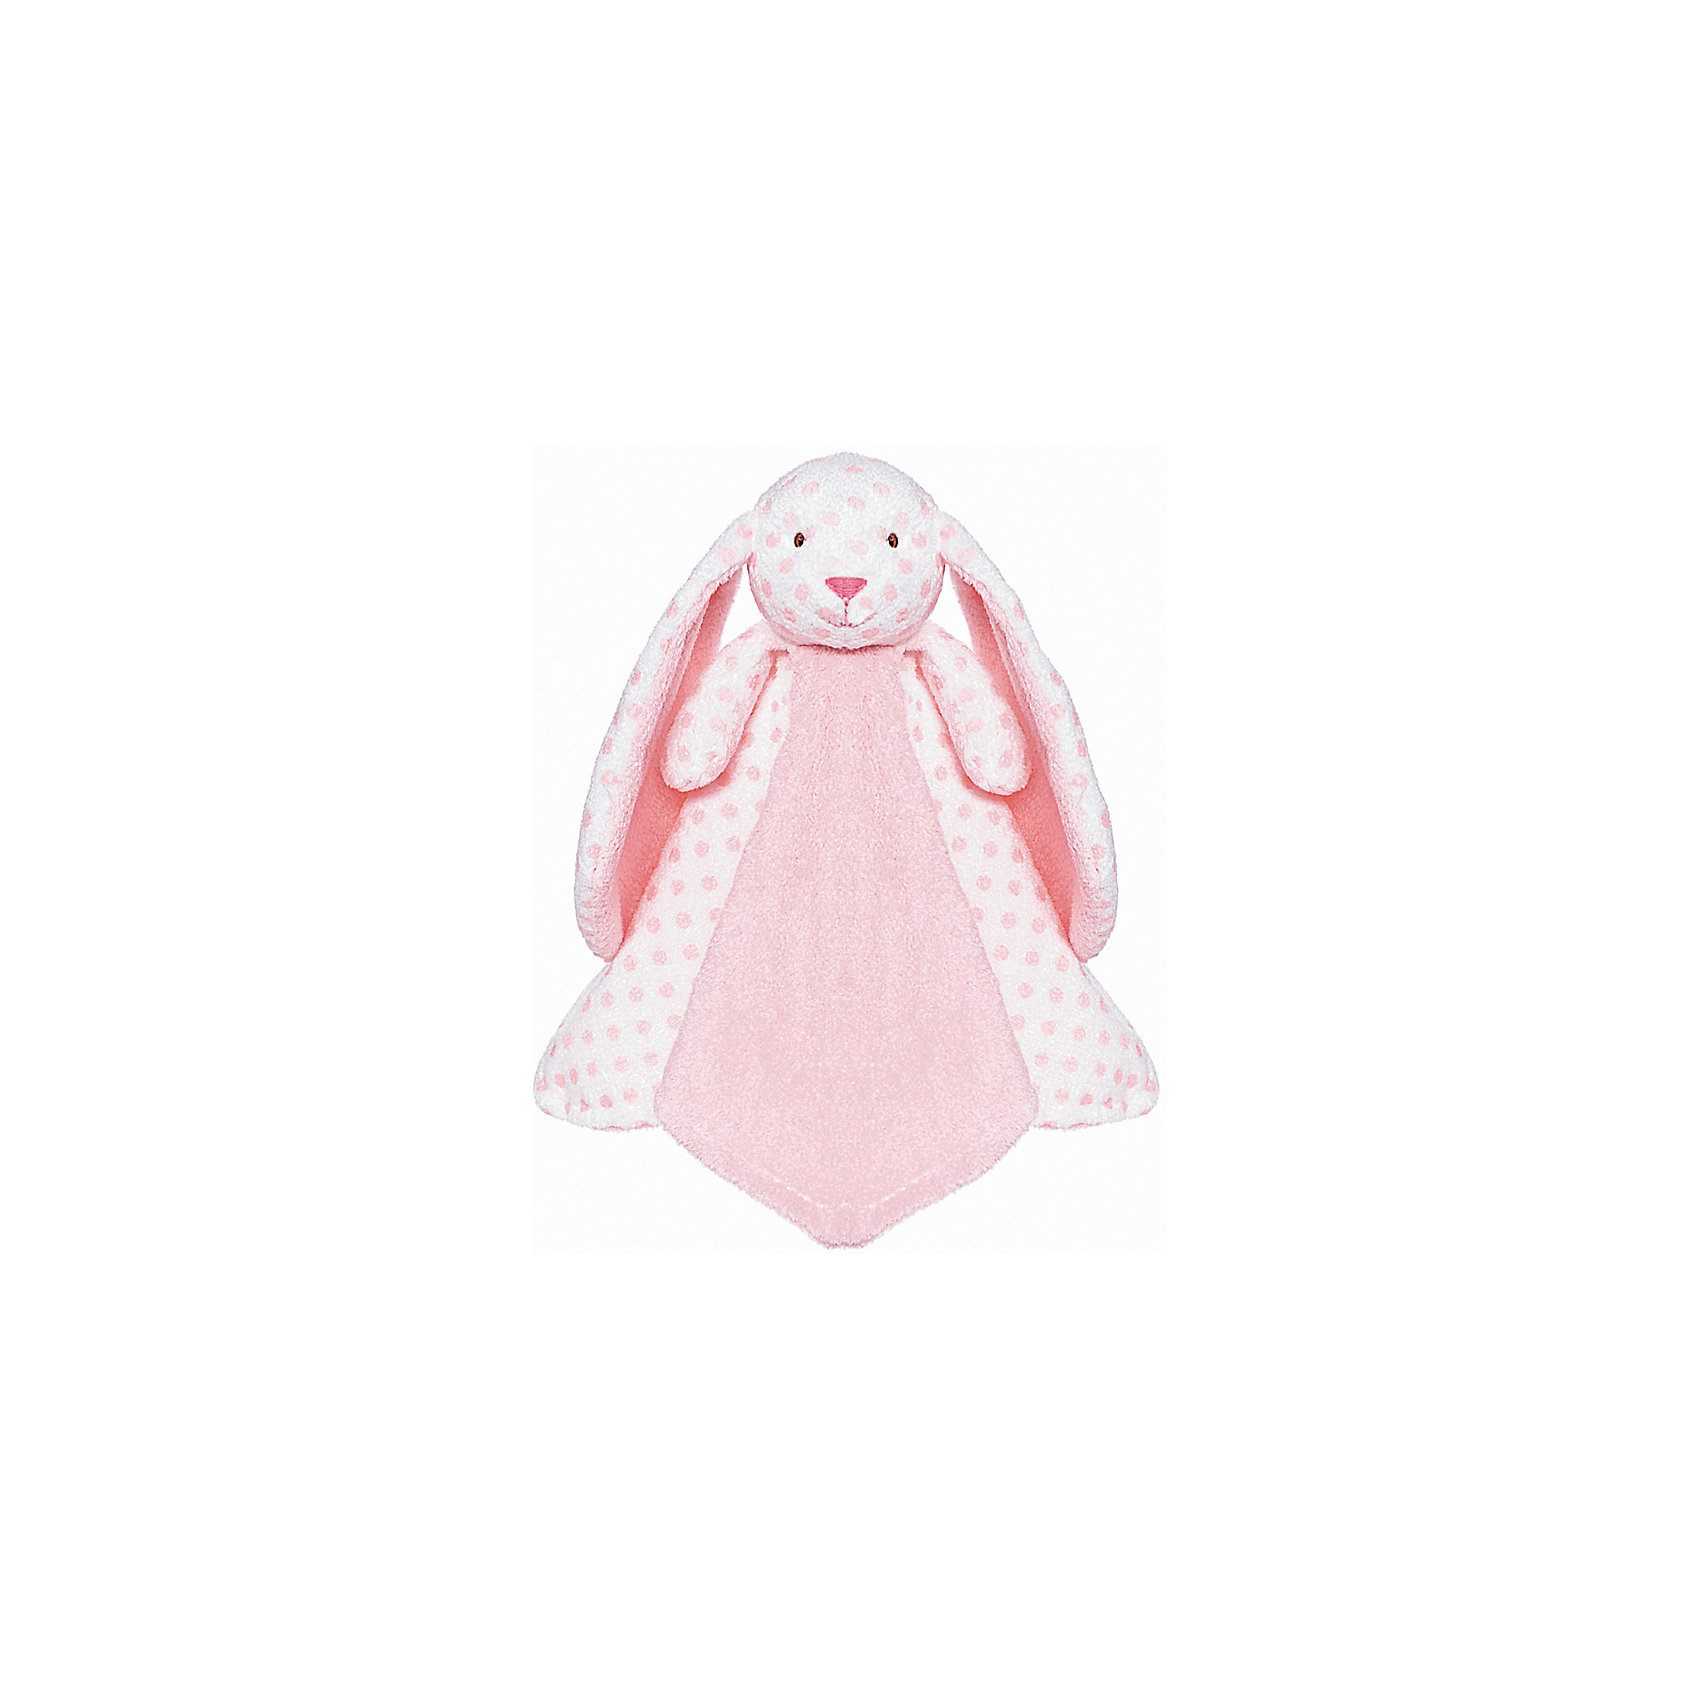 Teddykompaniet Платочек Кролик -  Большие ушки, Тедди бэби, Динглисар teddykompaniet подвесная игрушка единорог динглисар teddykompaniet